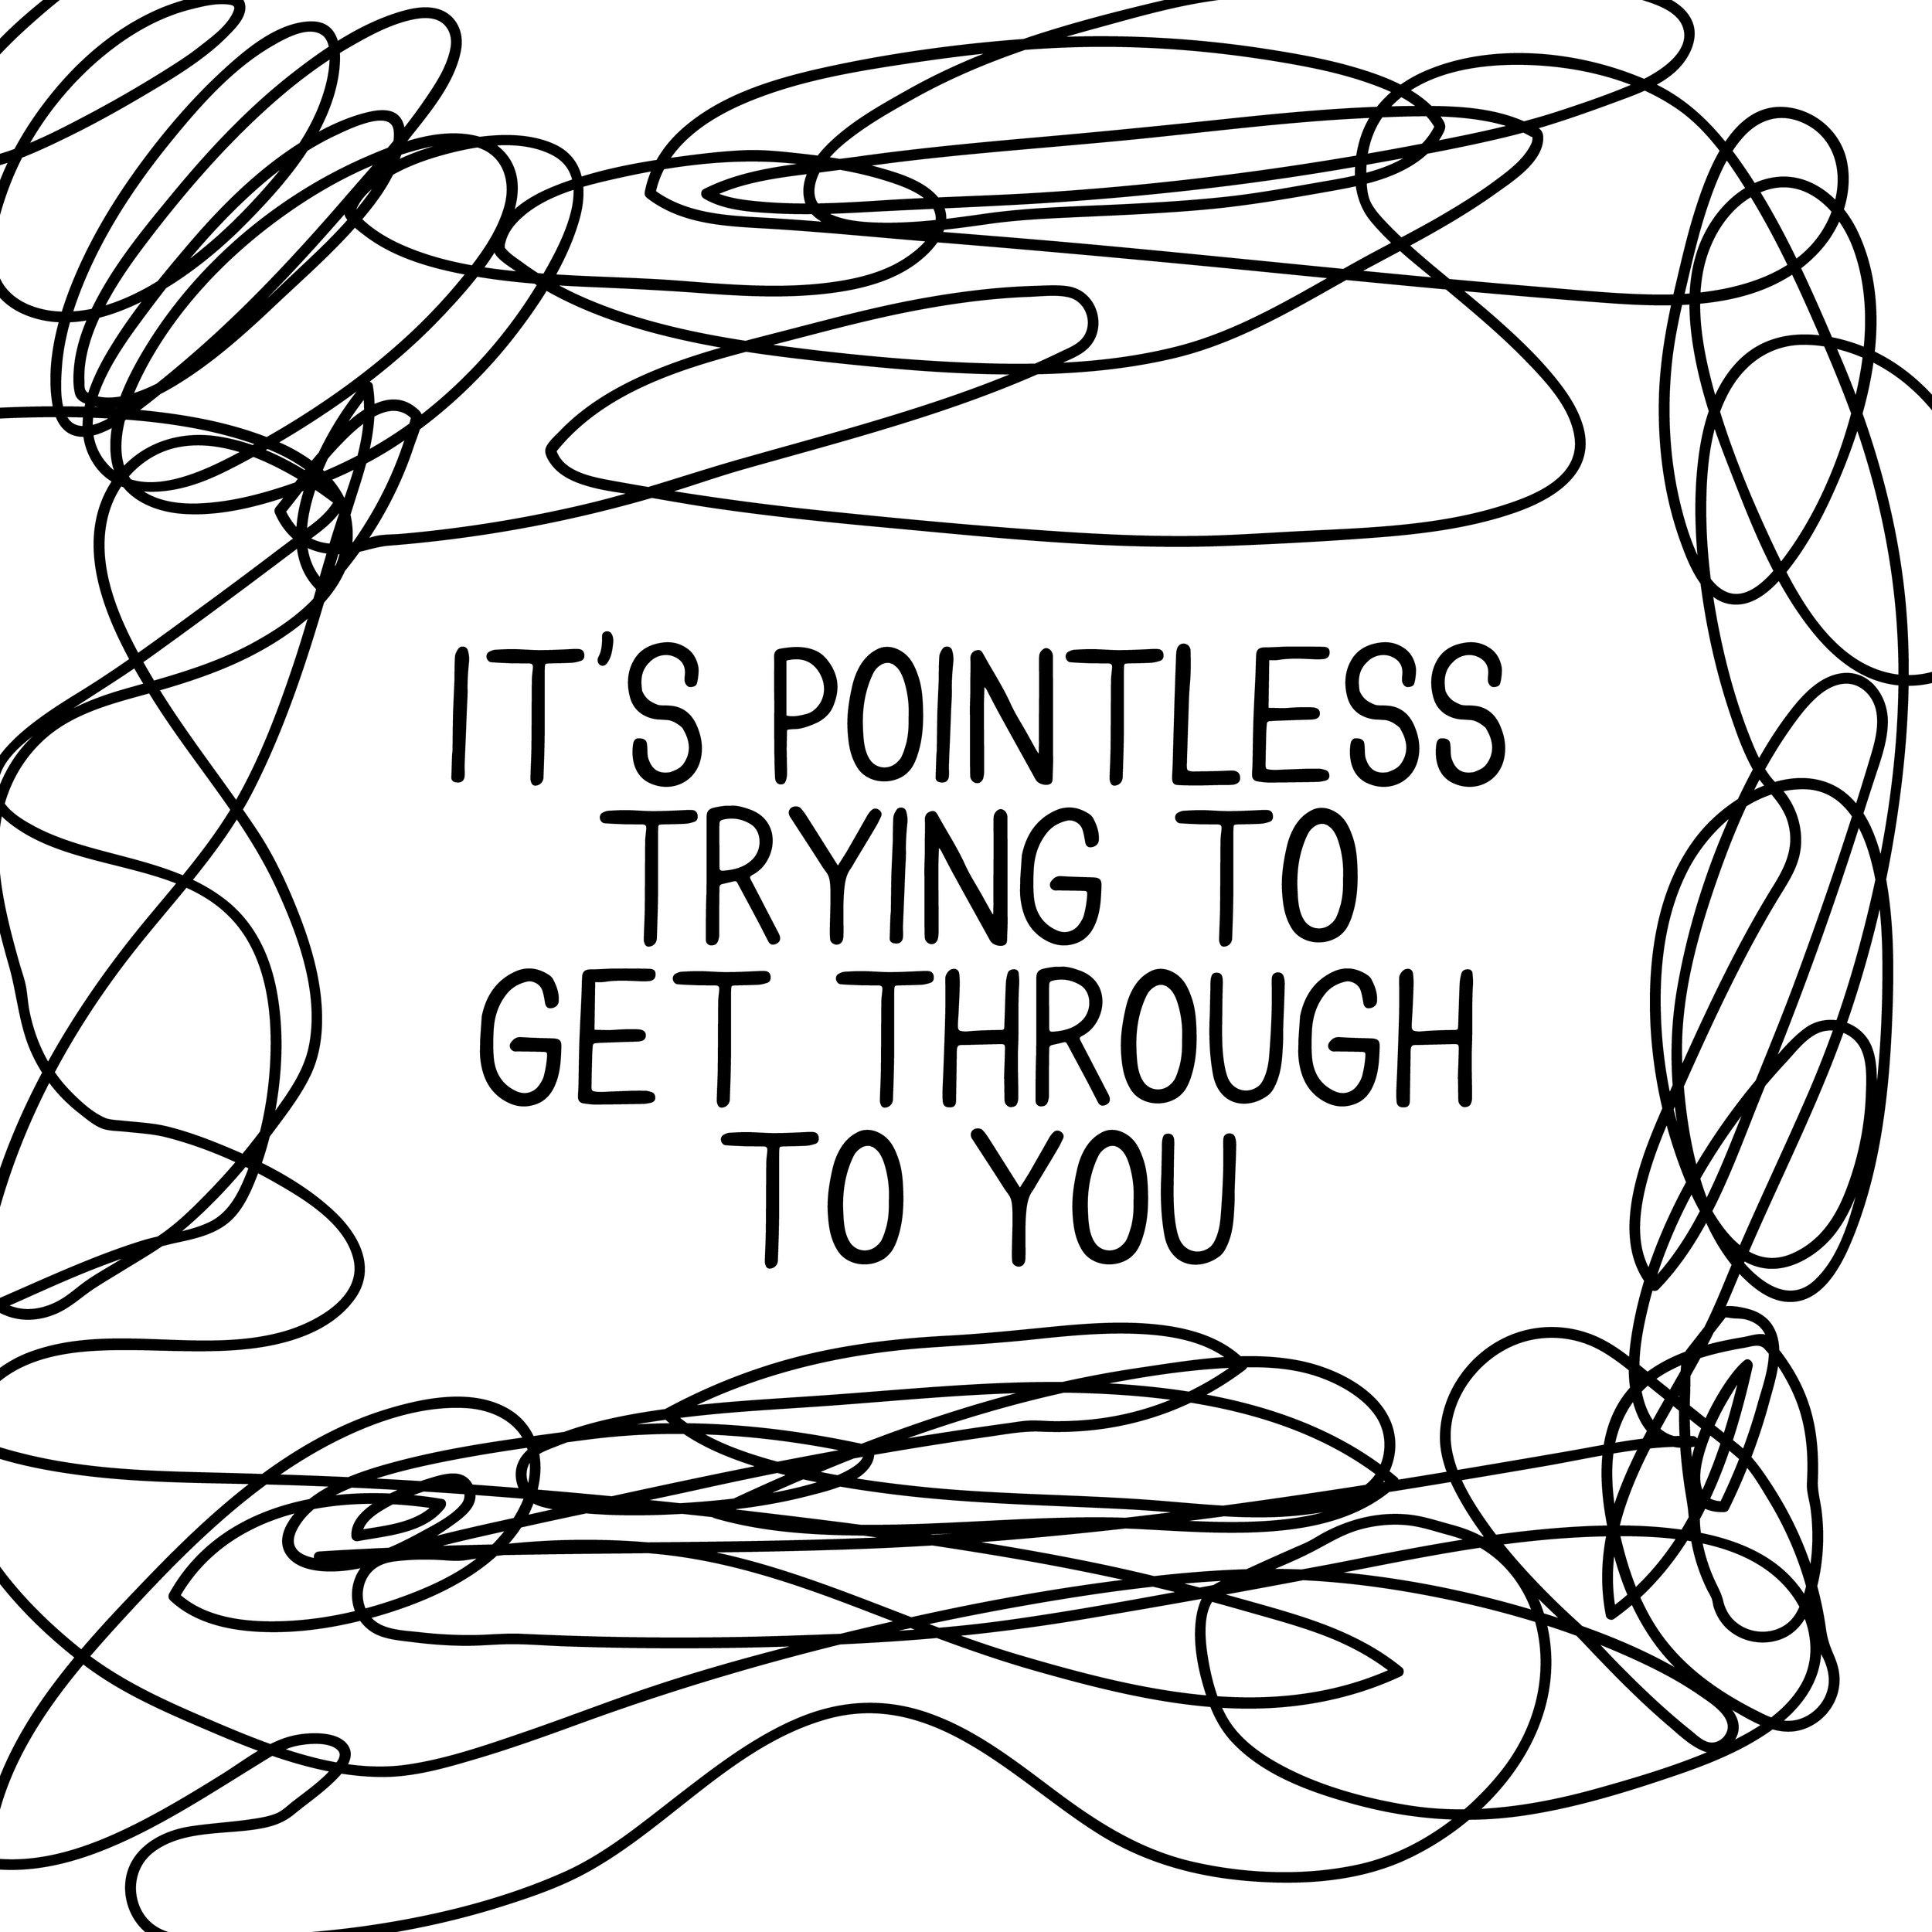 pointless-01.jpg